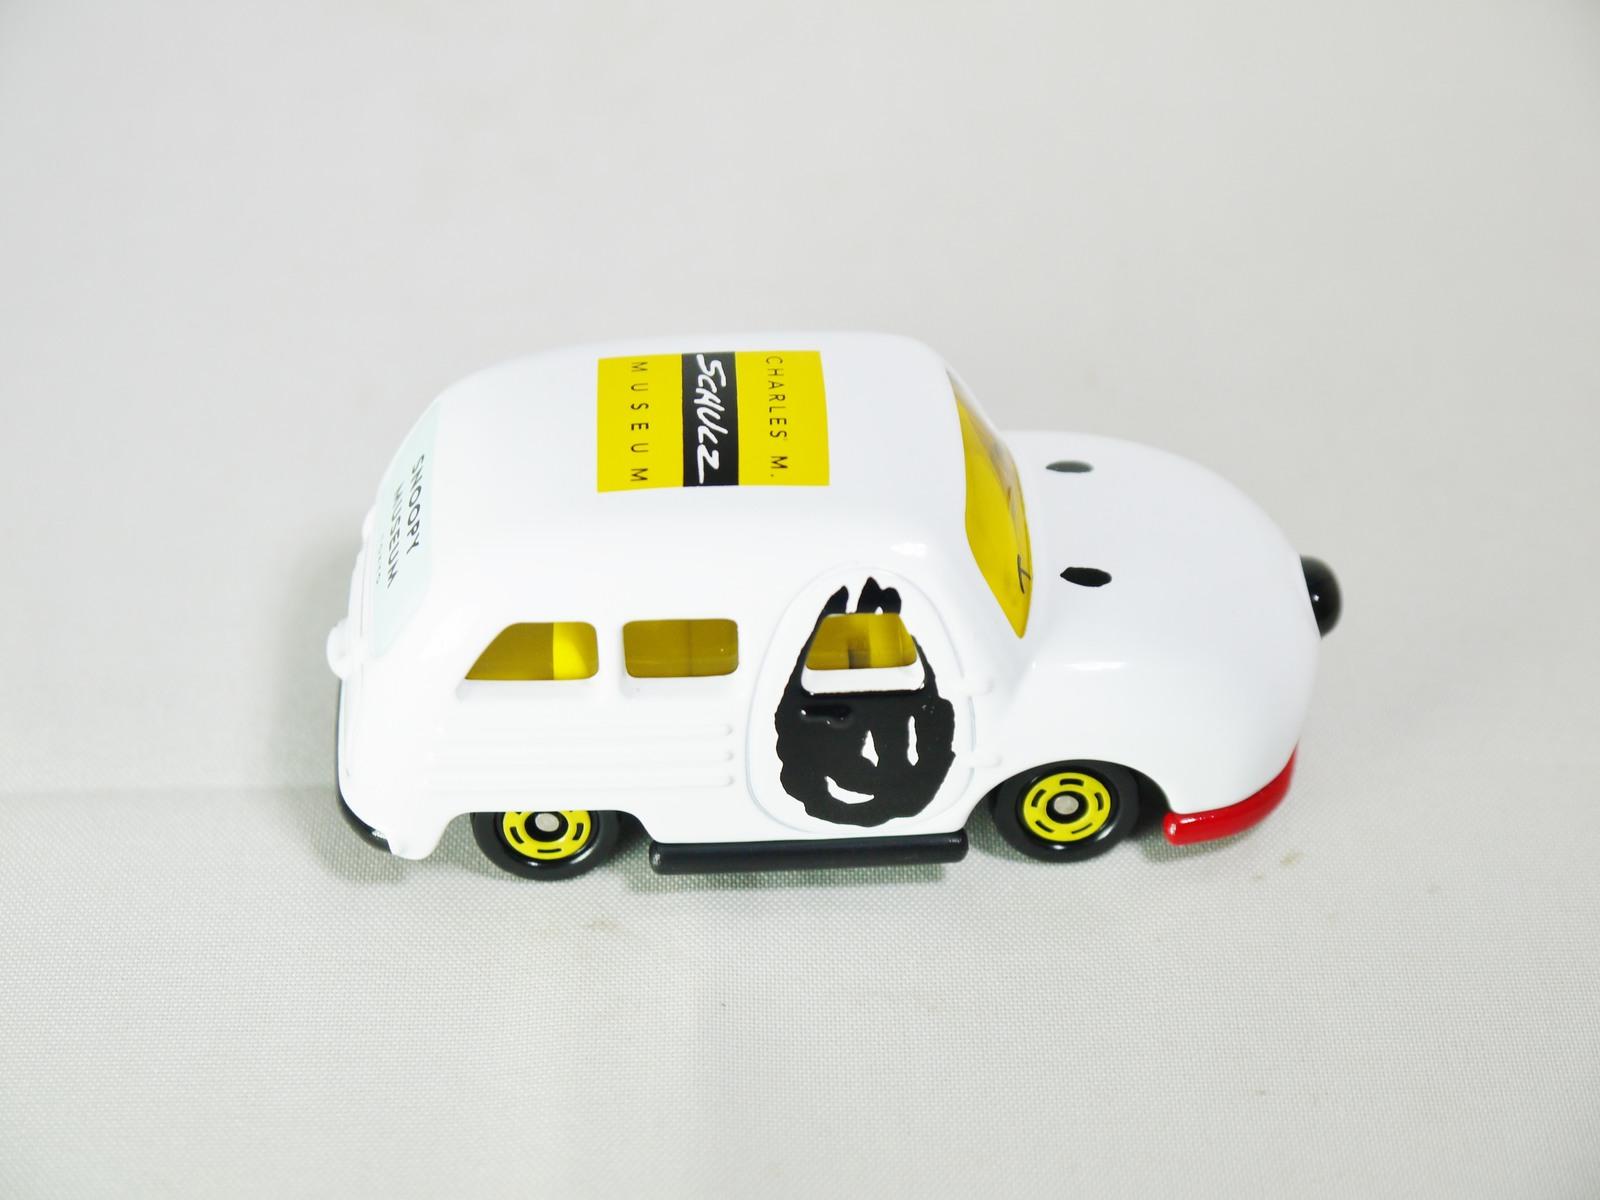 TAKARA TOMY TOMICA DREAM SNOOPY MUSEUM TOKYO INITIAL Version Die-cast Car